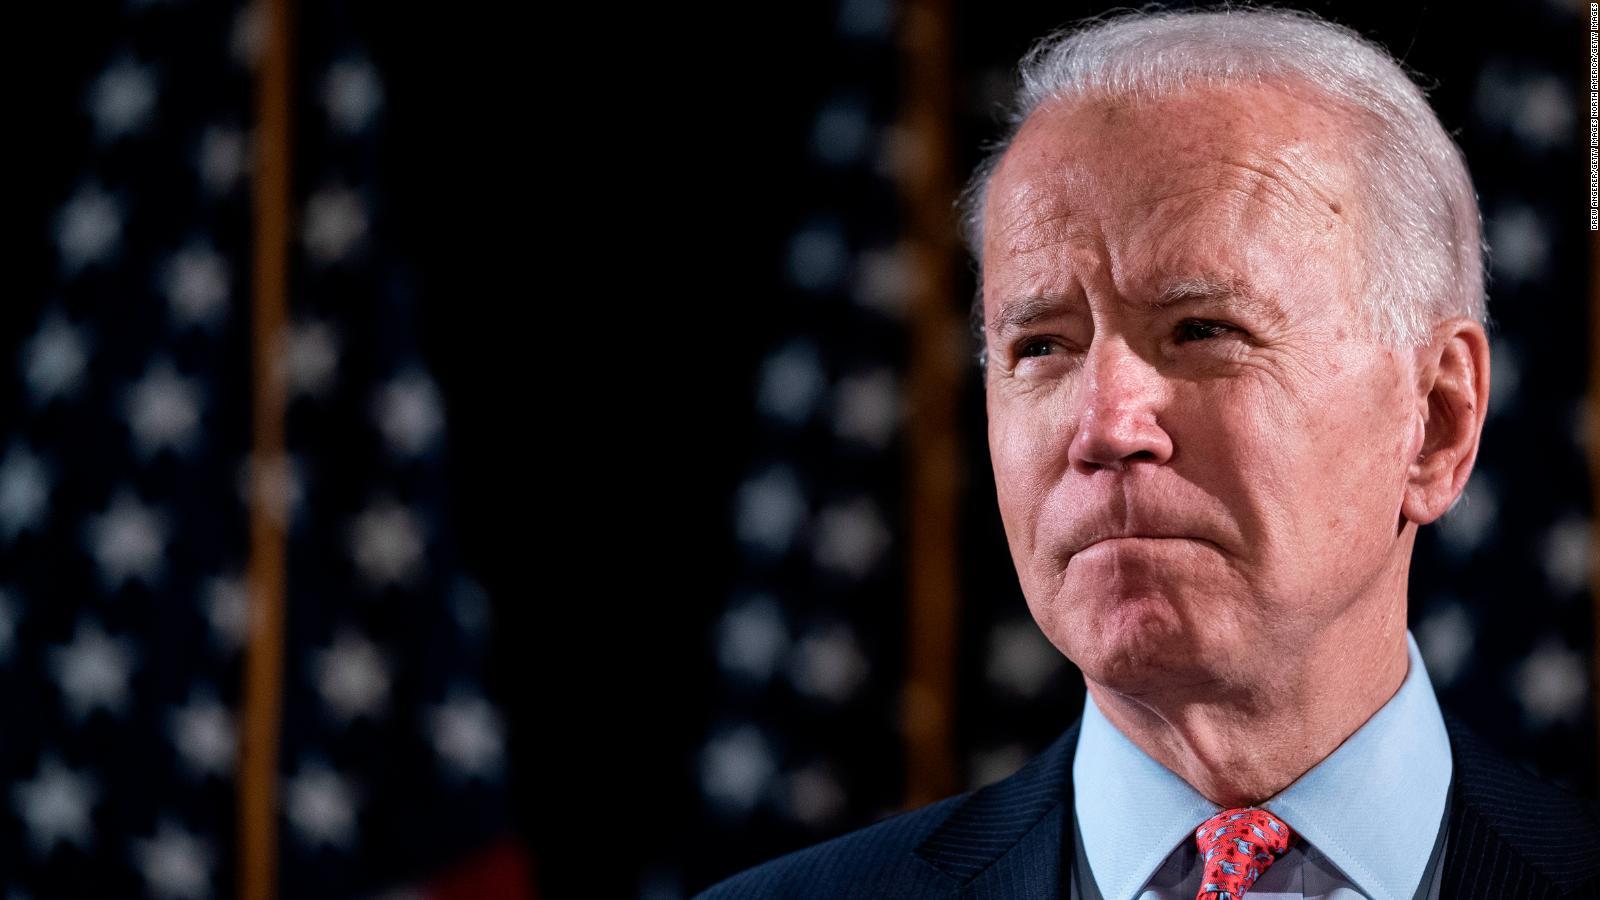 Kamala Harris Is Biden's Choice for Vice President